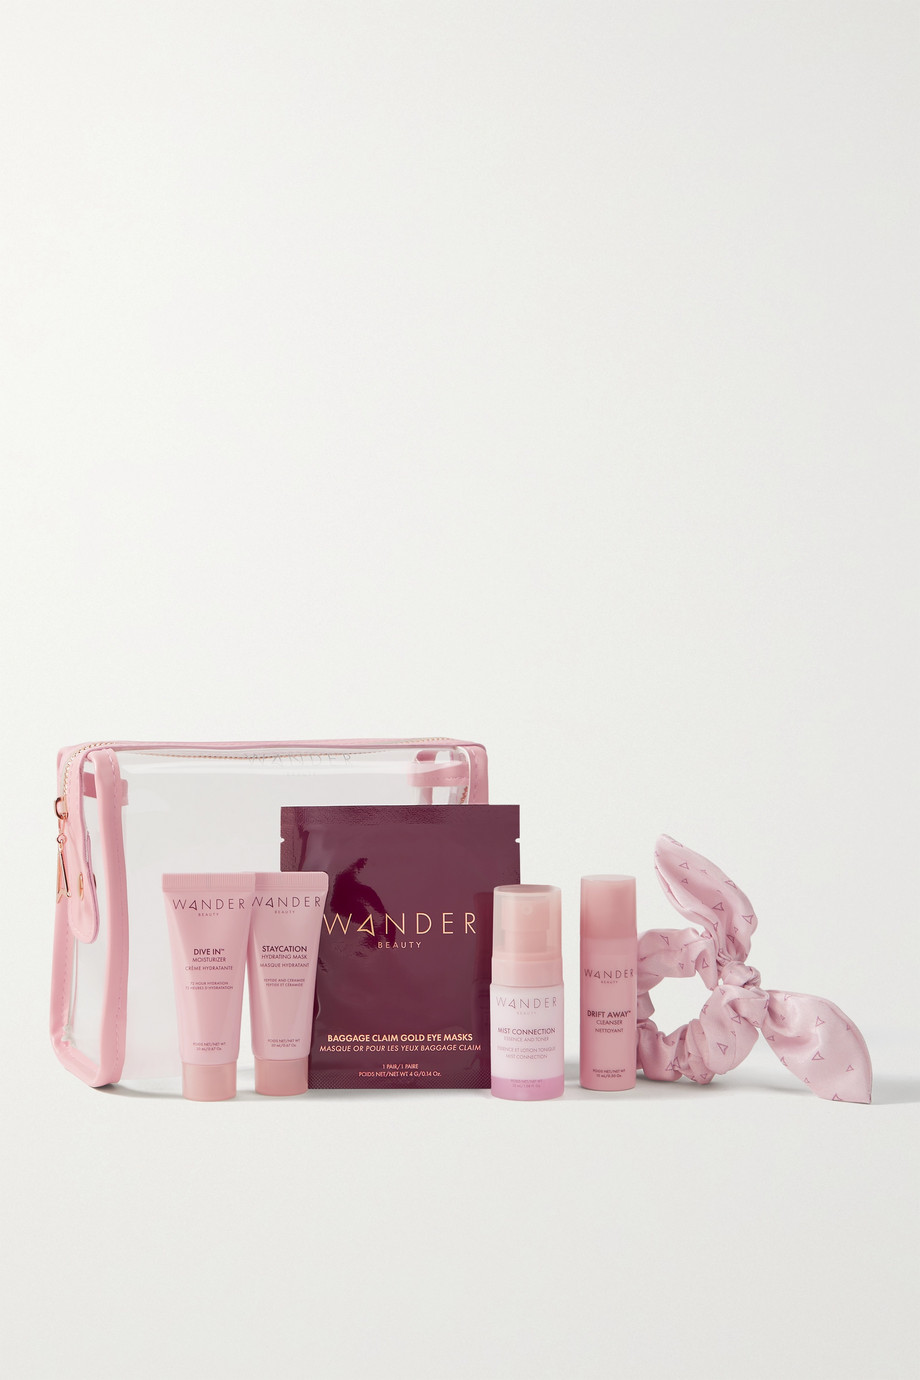 Wander Beauty Airplane Mode™ Round Trip Kit – Reiseset